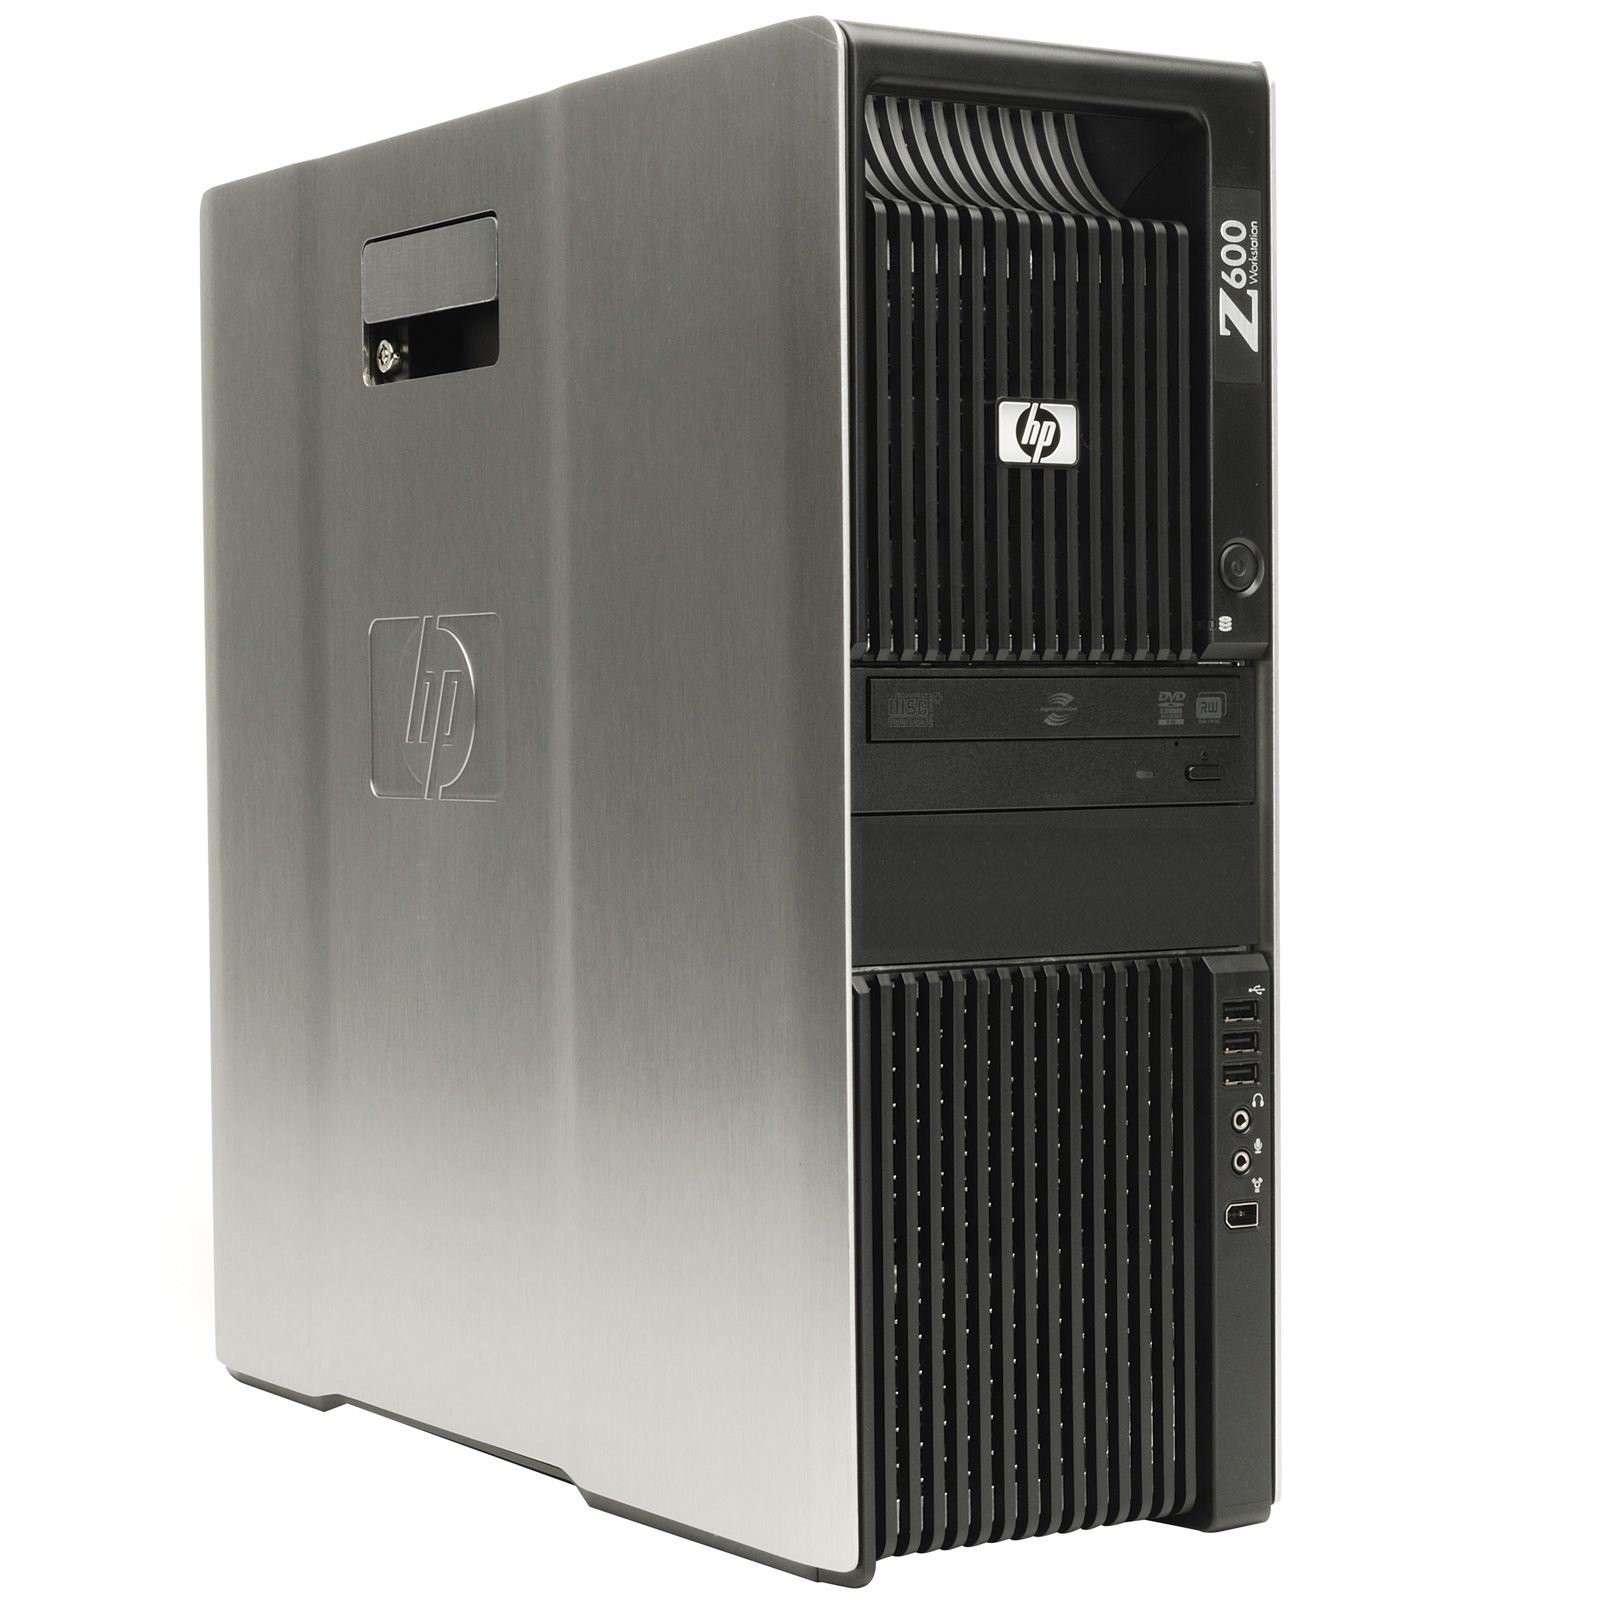 HP Z600 Workstation 2x Intel Xeon X5650 2x 500GB Sata 24GB Speicher Win 10 Pro